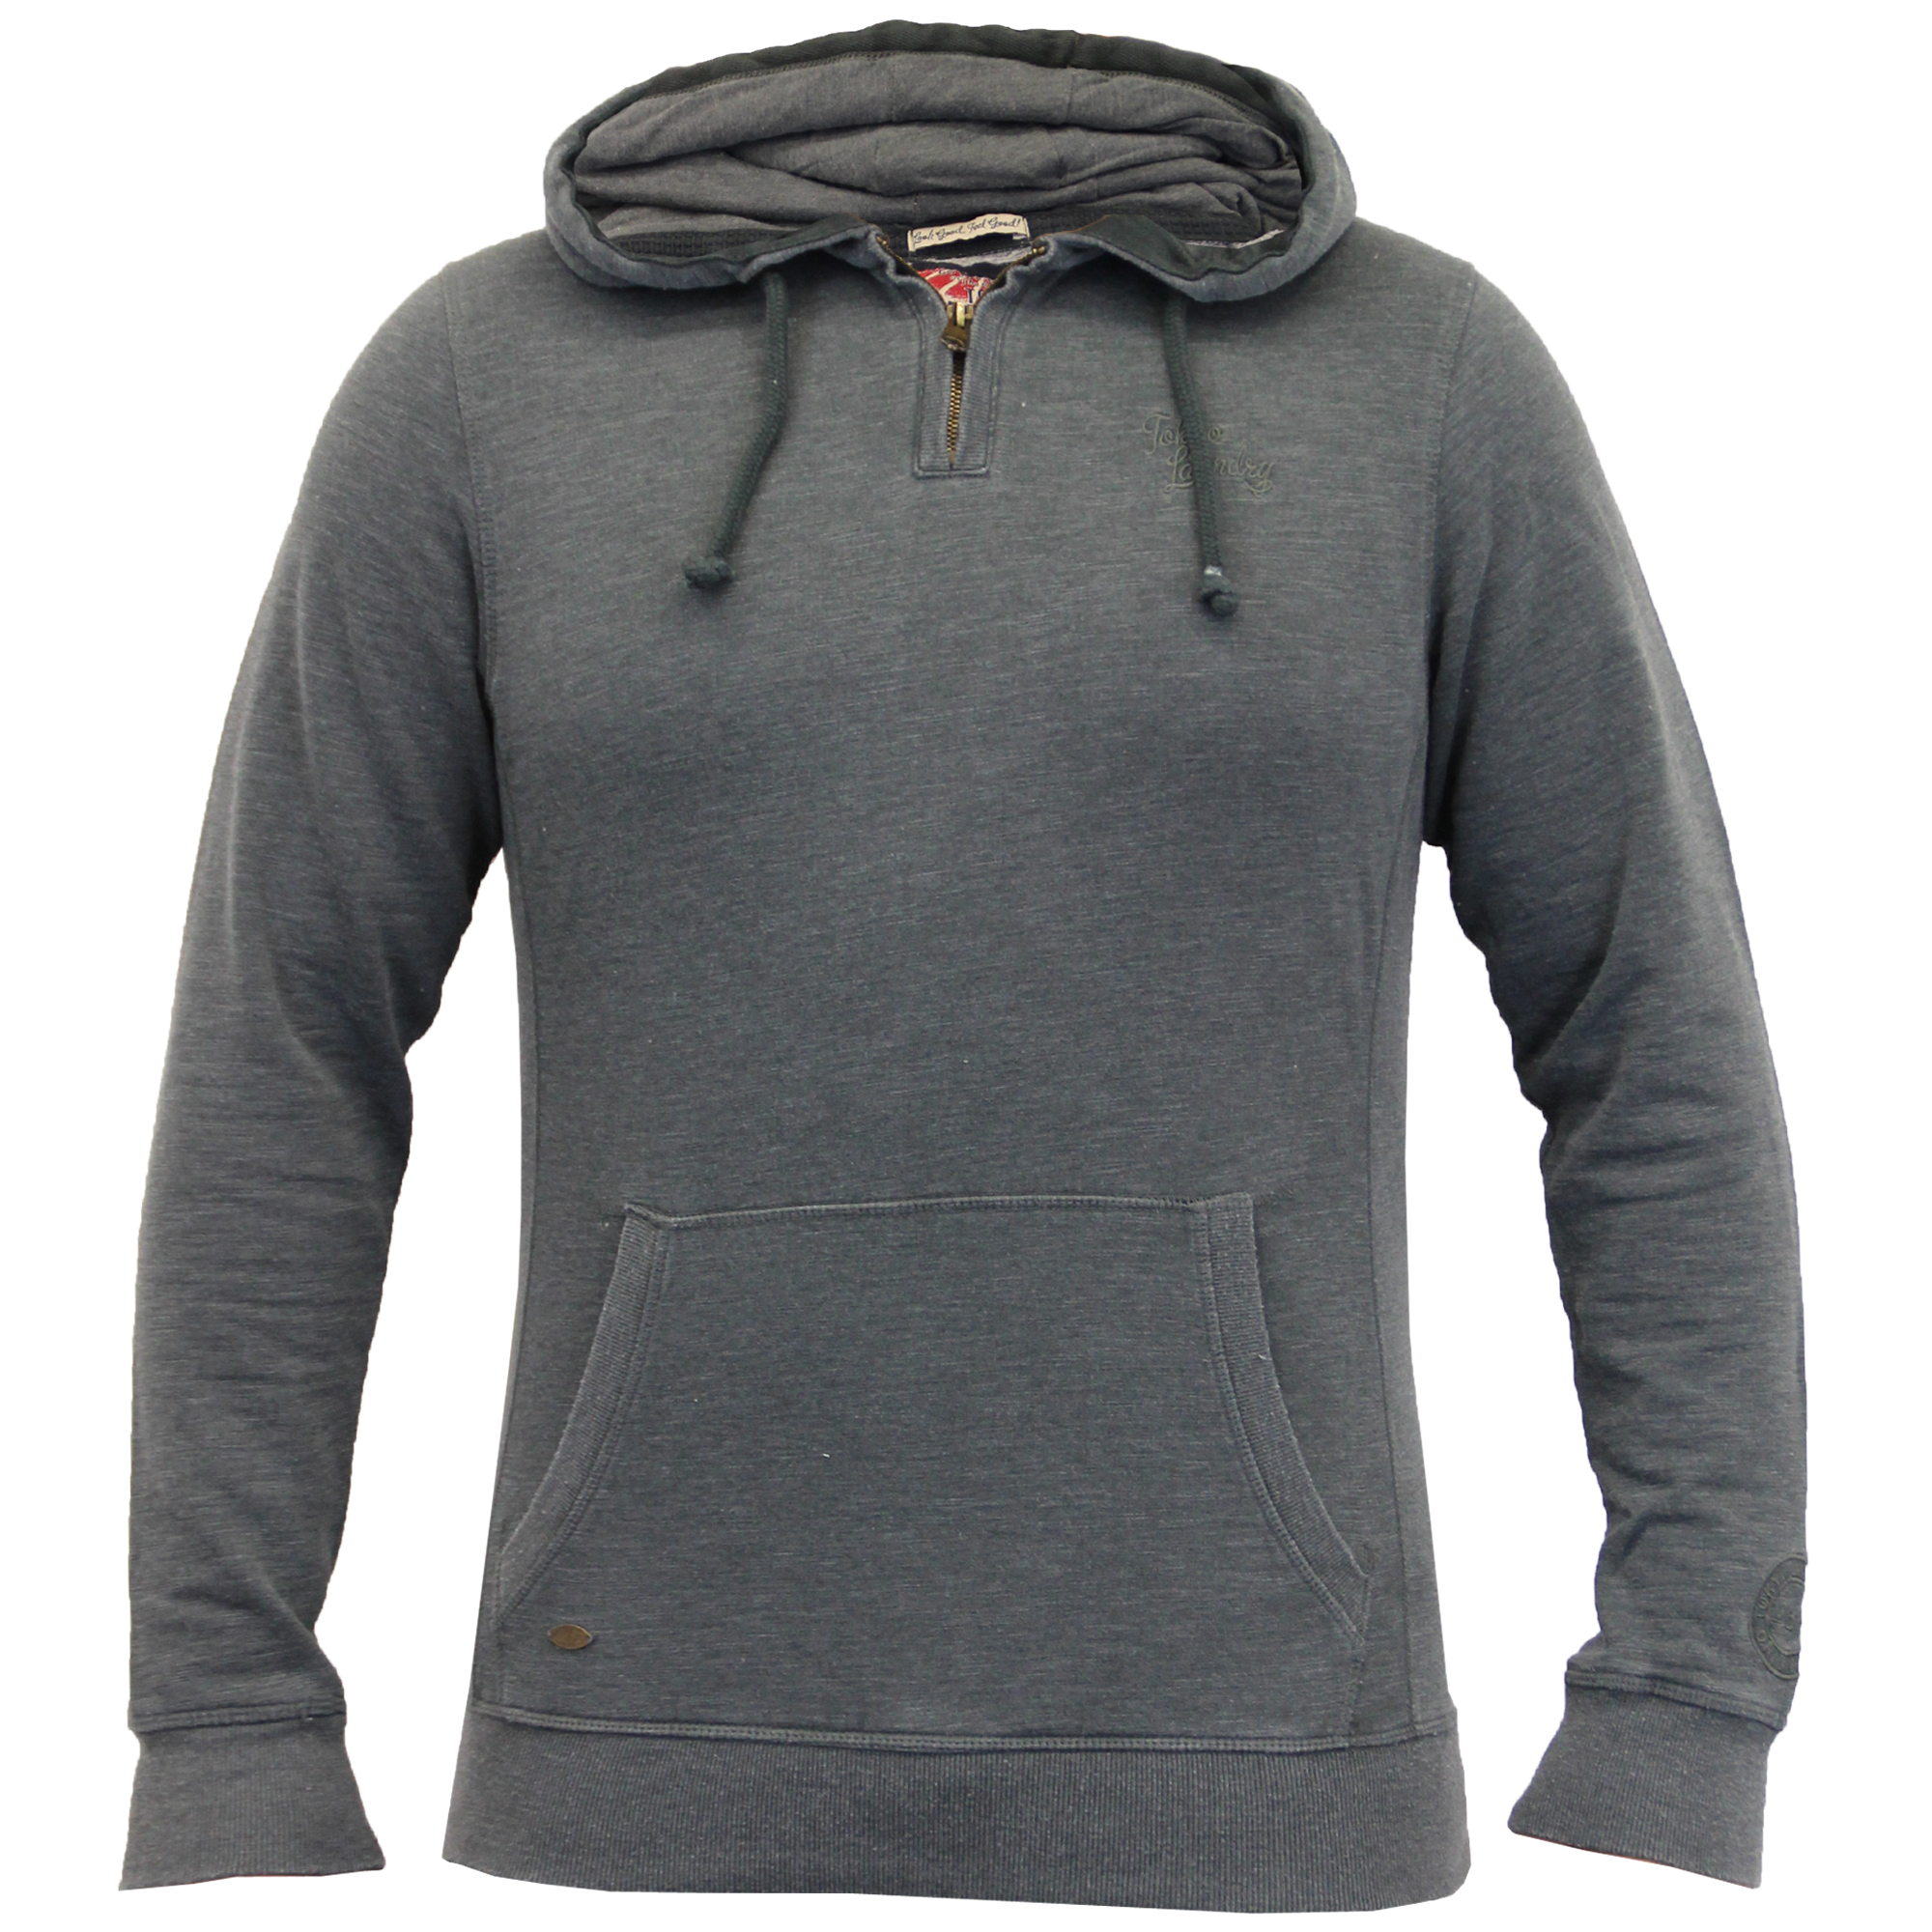 Mens-Sweatshirt-Tokyo-Laundry-Hooded-Top-Sweat-Applique-Zip-Gym-Fleece-Lined-New thumbnail 12